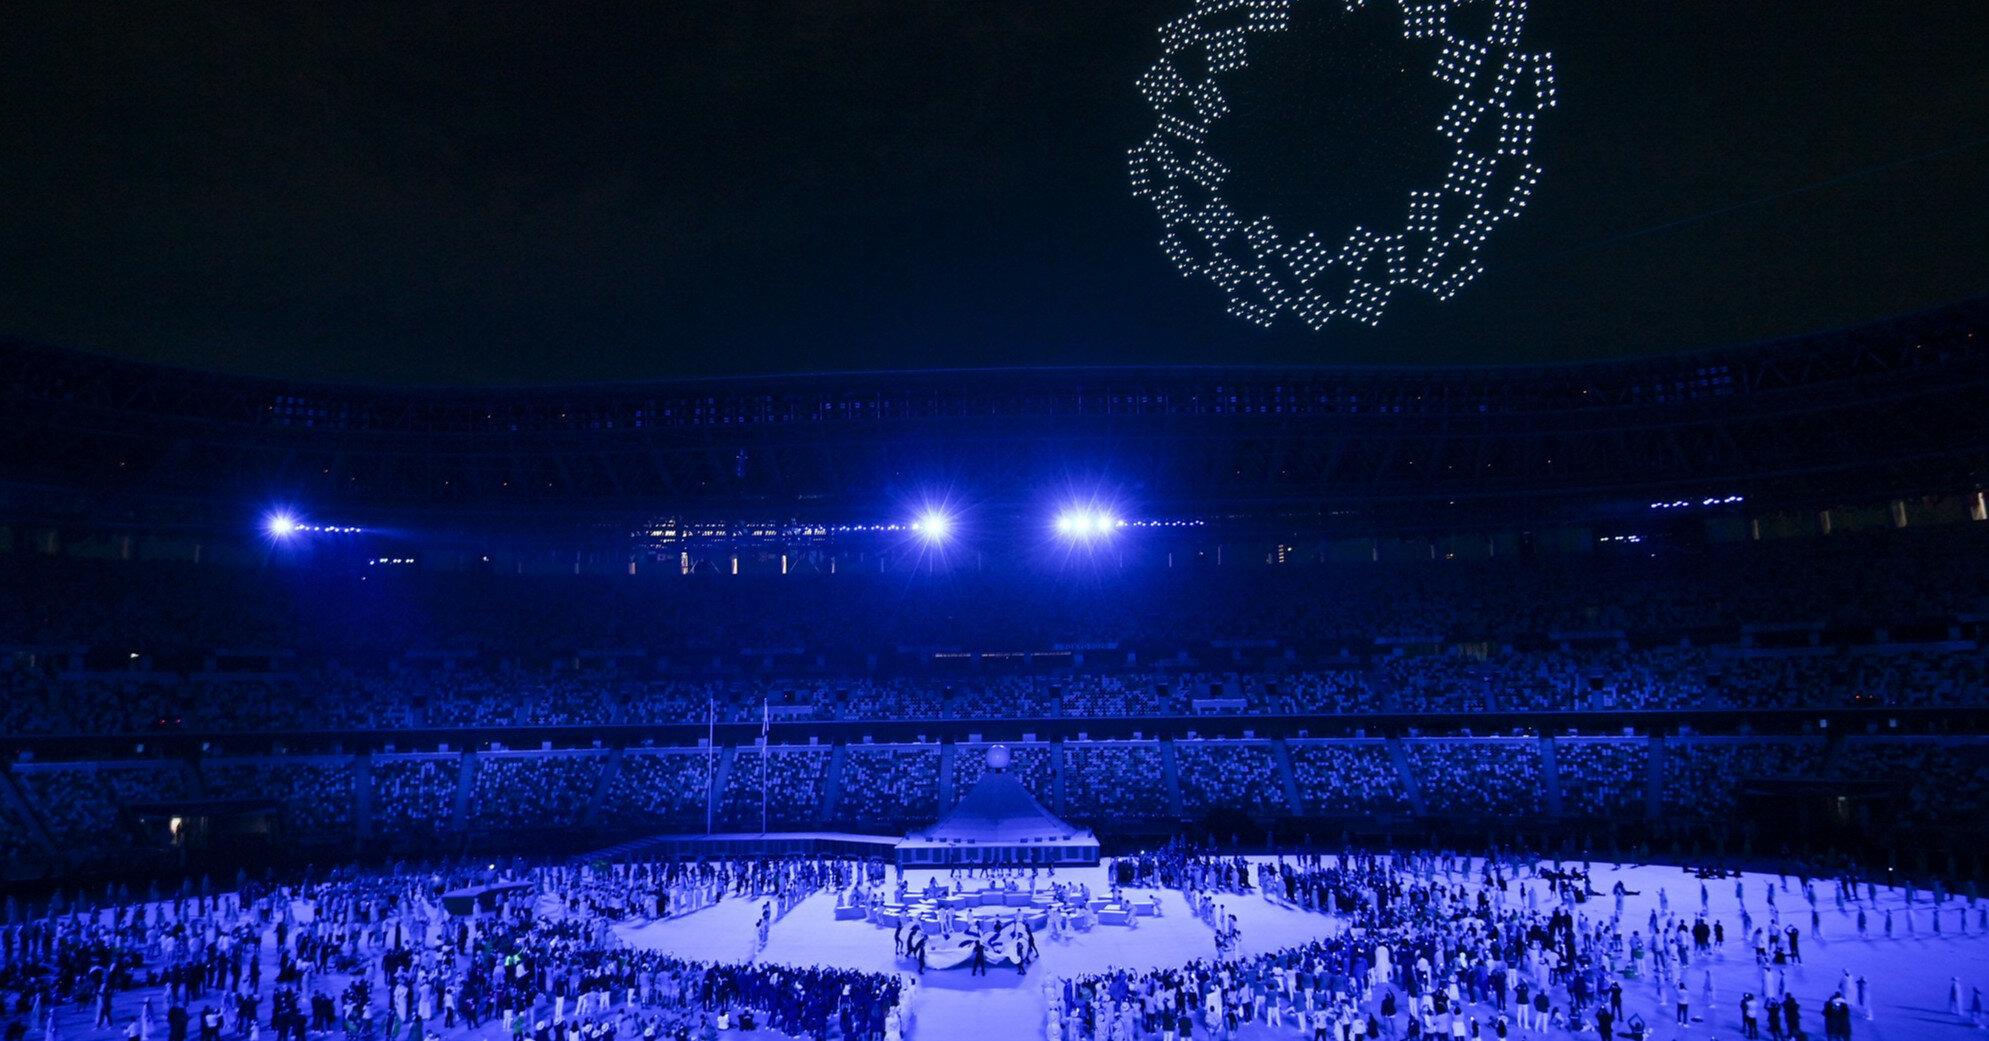 Украина сенсационно завоевала 8-ю медаль на Олимпиаде-2020